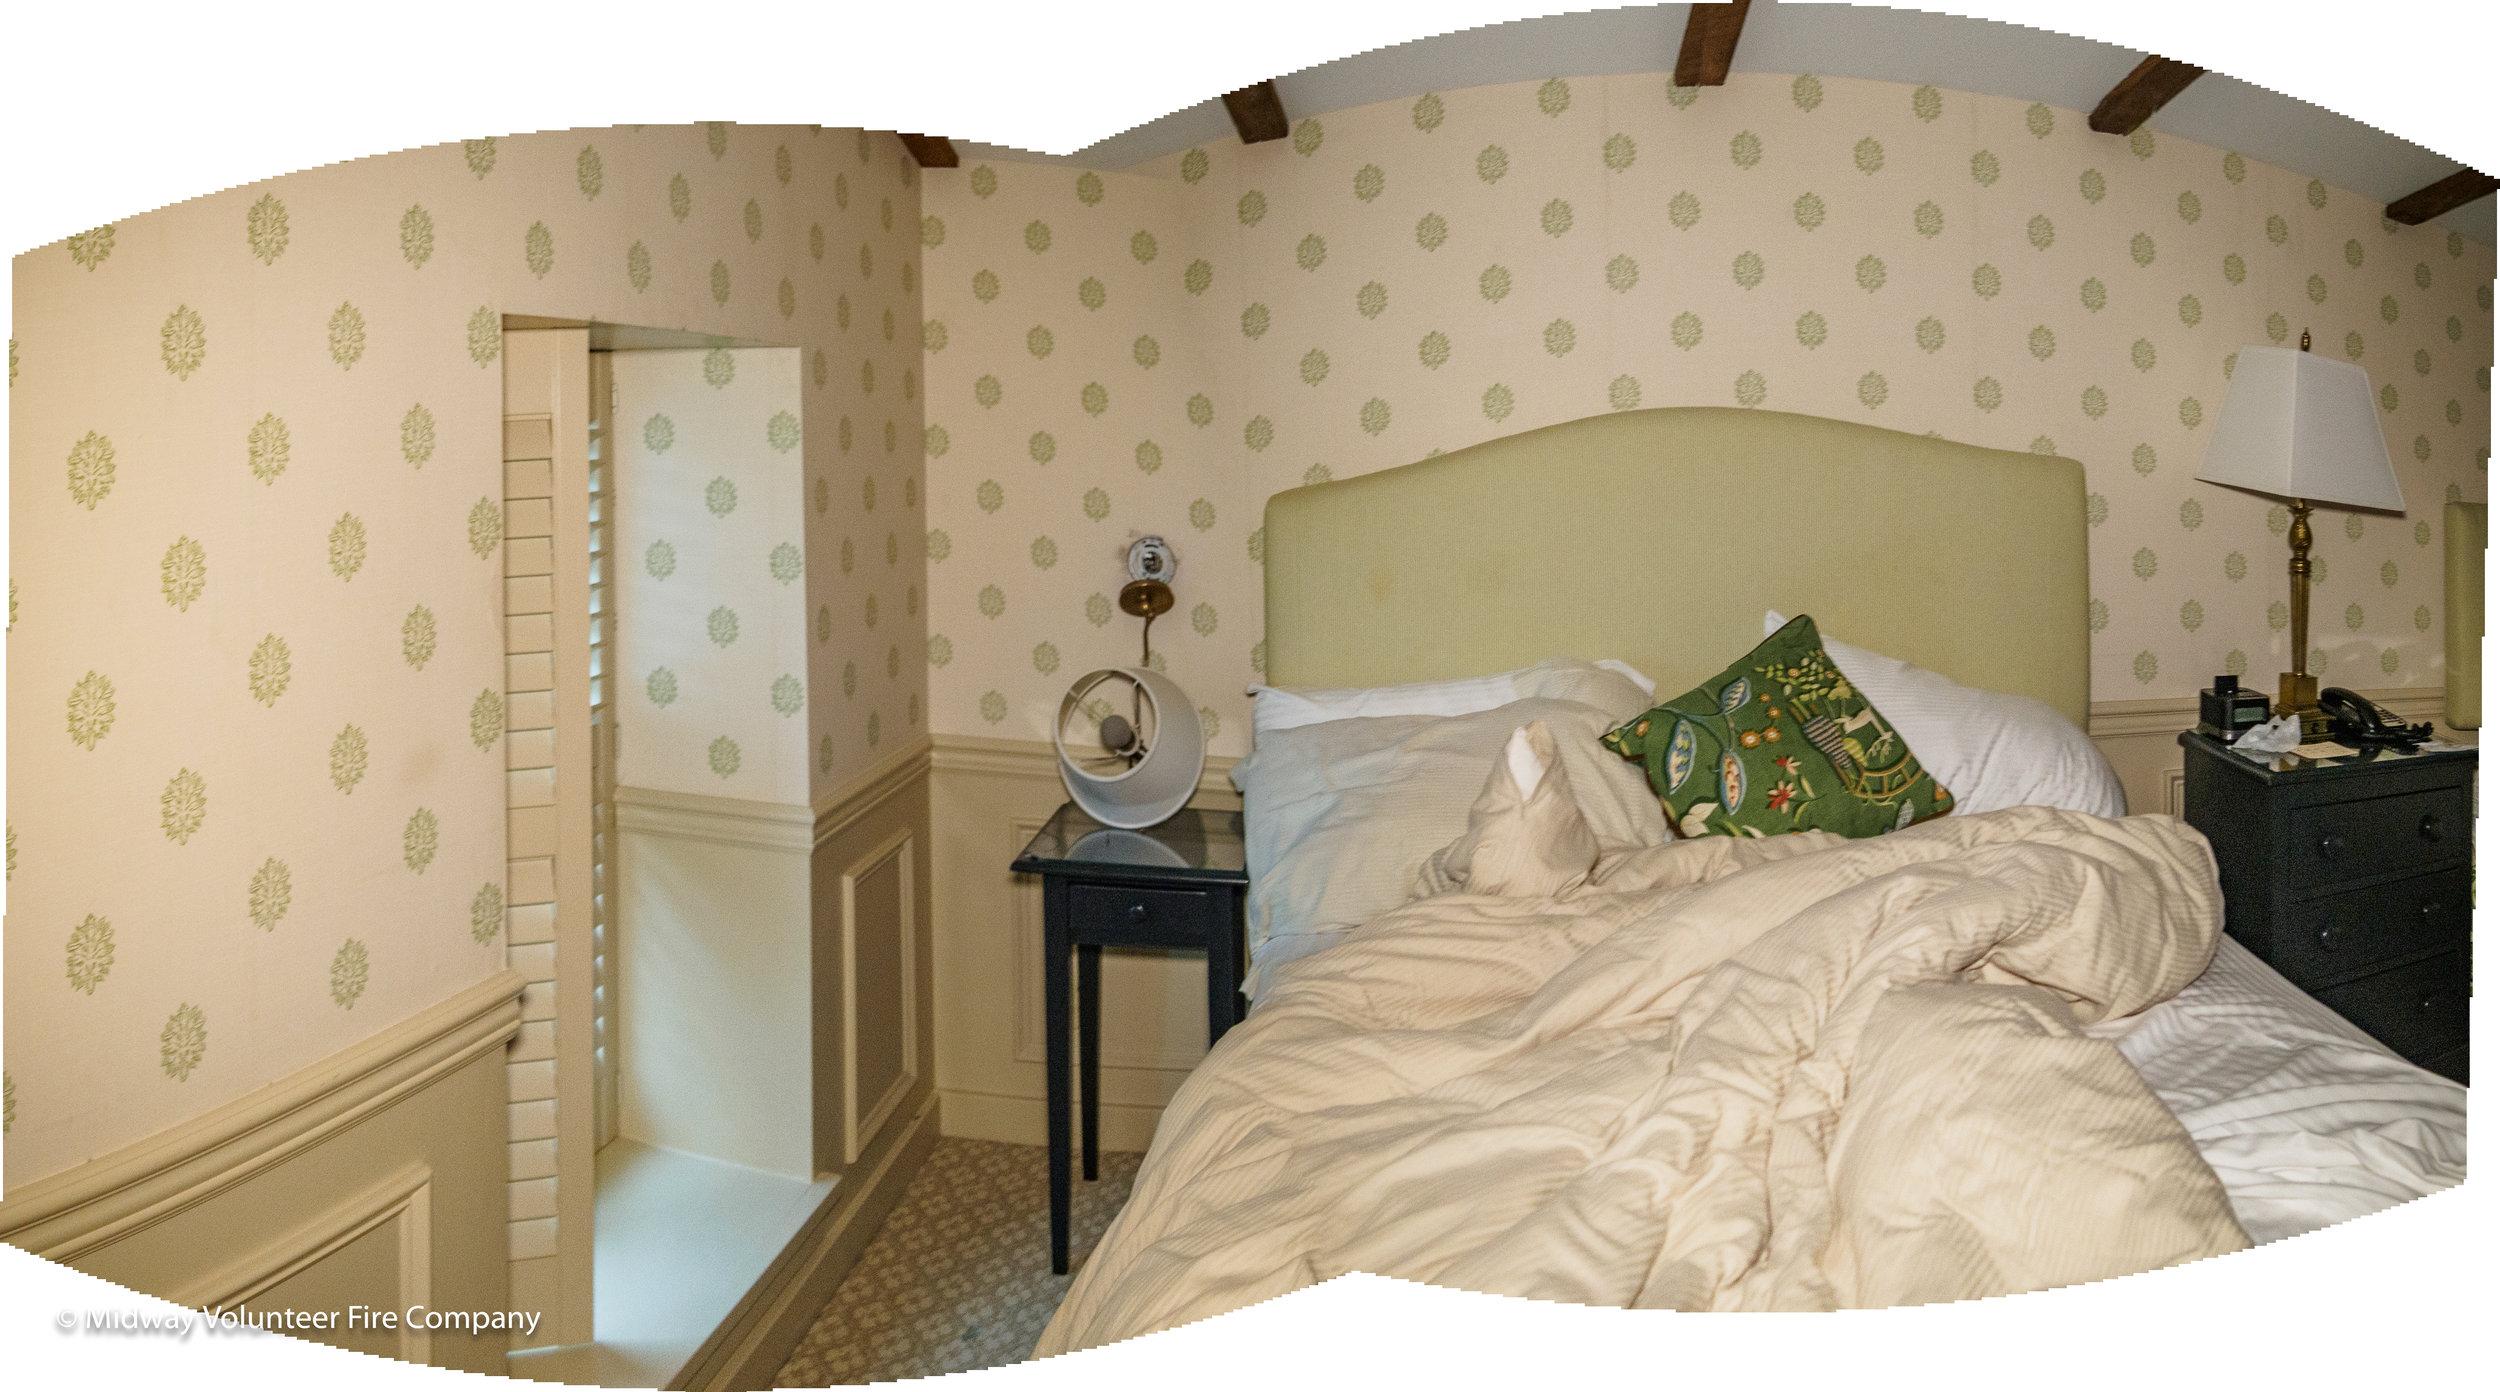 MVFC - Pano Room Near Fixture-P5121858-Edit.jpg